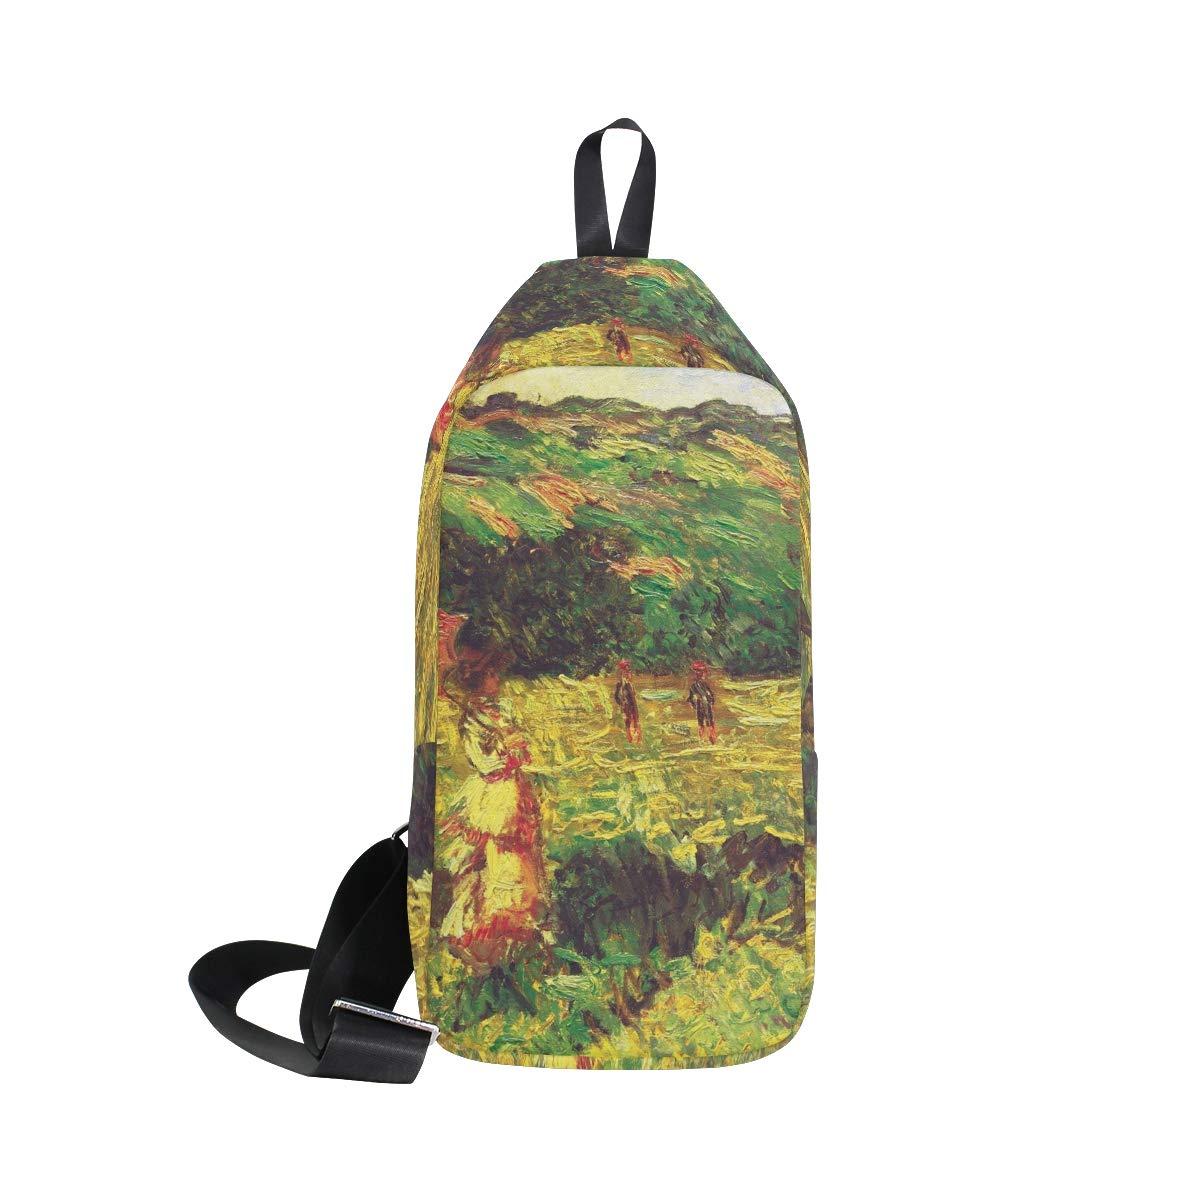 AHOMY Monets The Promenade Near Limetz Messenger Bag Small Travel School Sling Bag Crossbody Bag